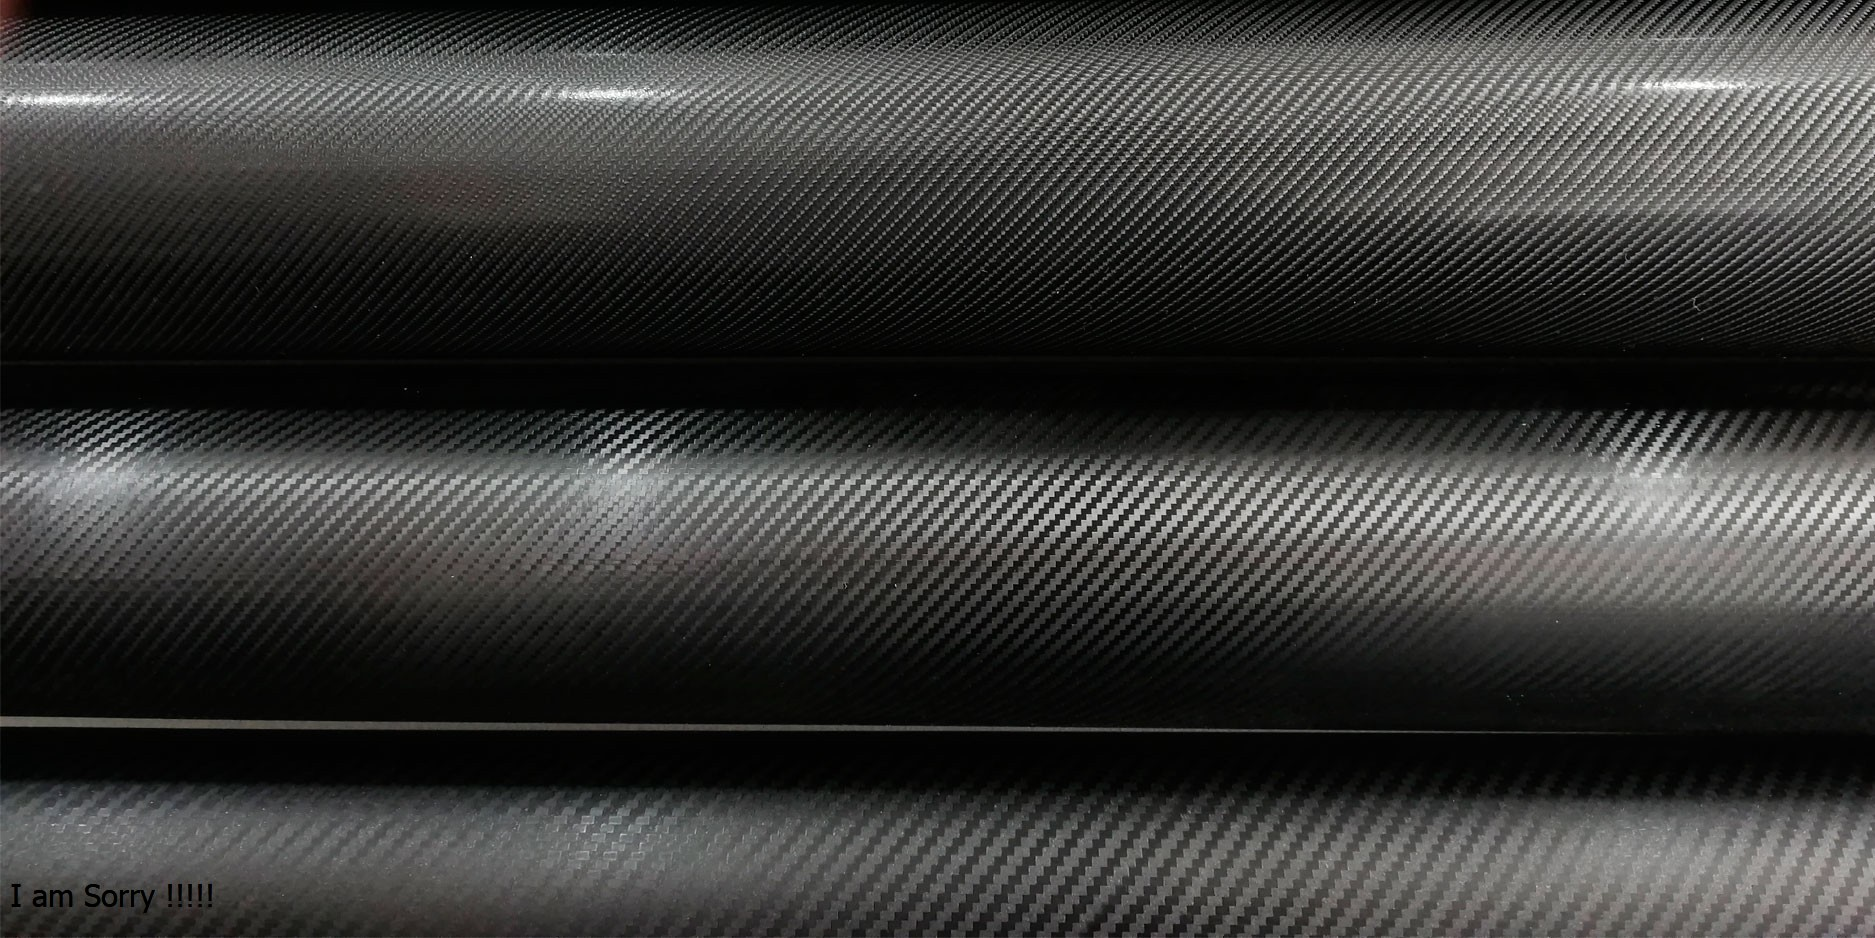 fibra-carbono-web